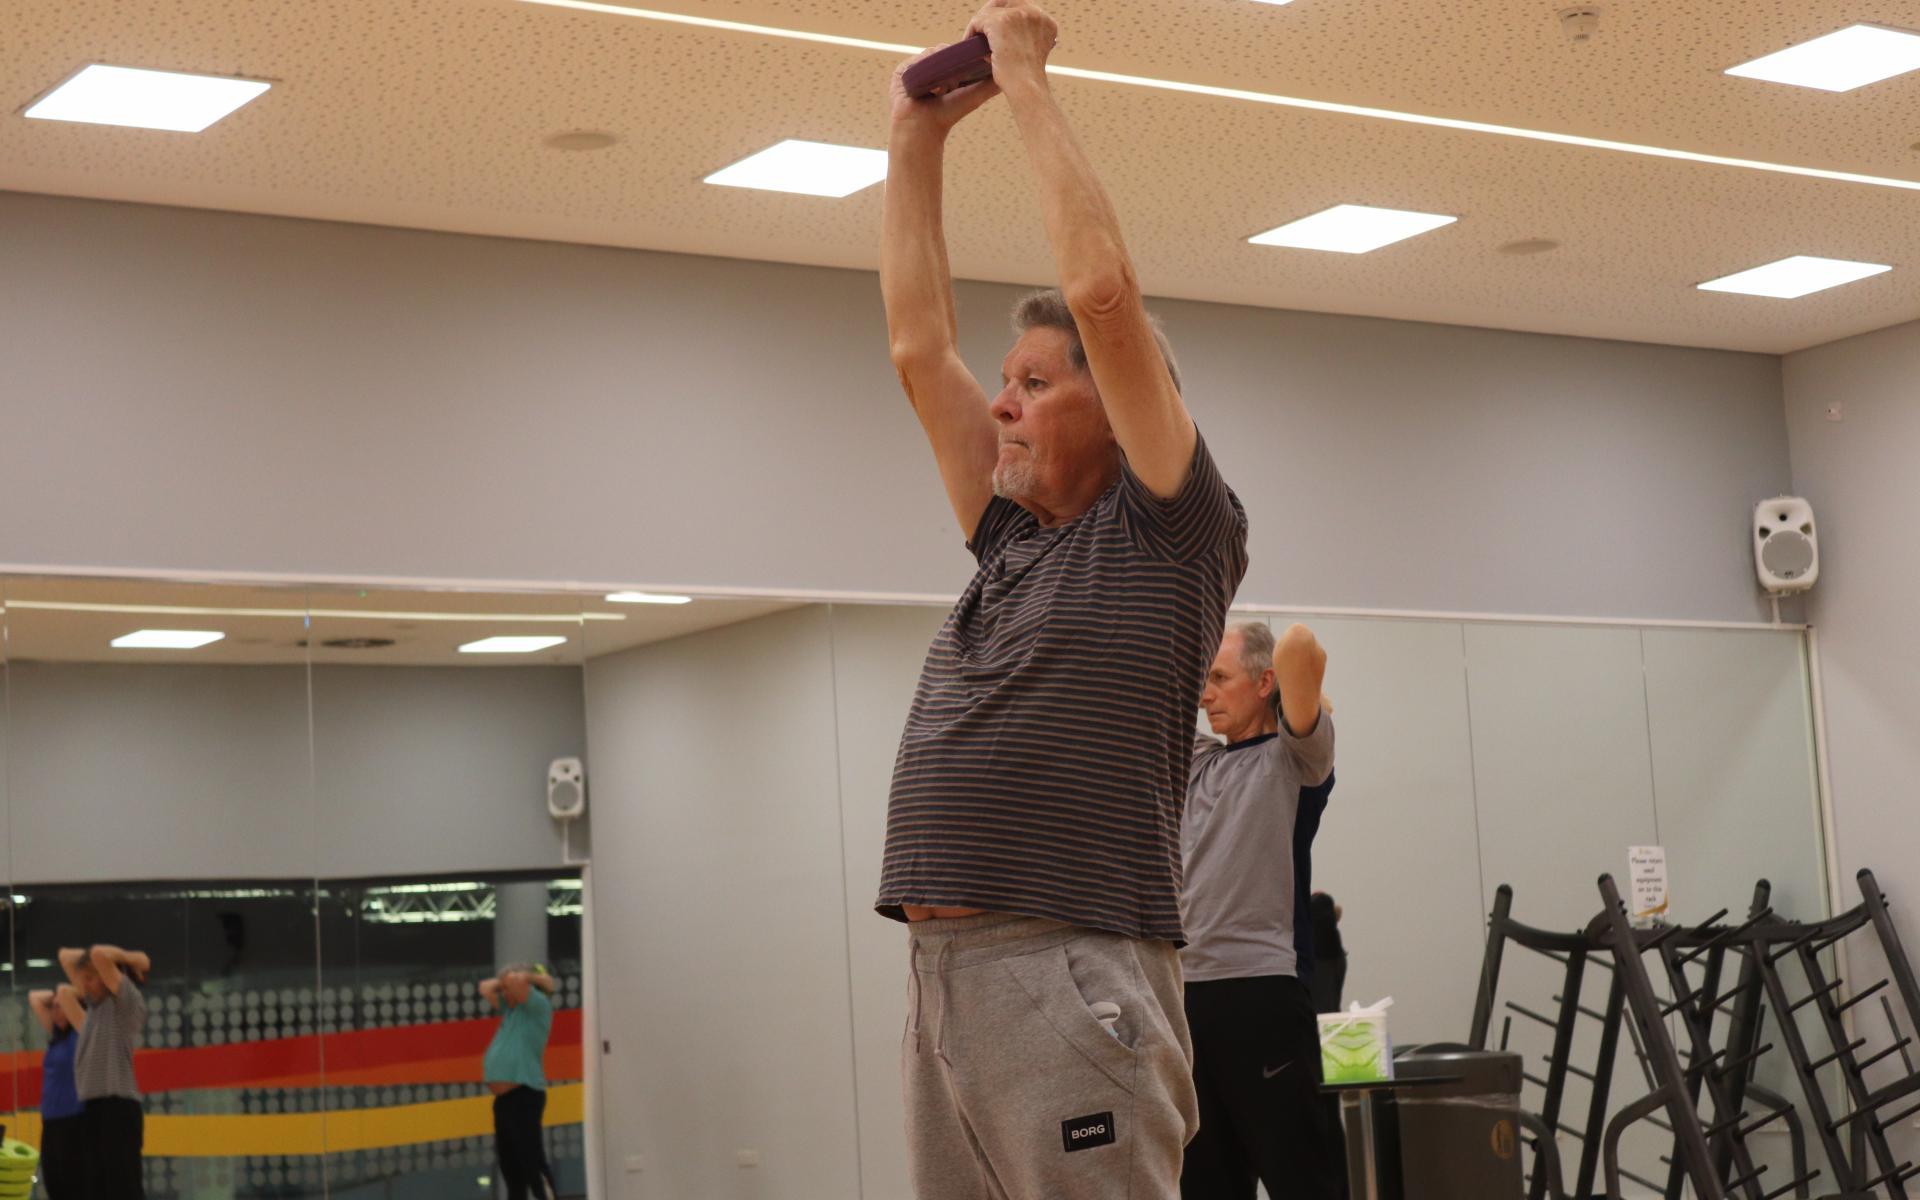 Participants enjoy a strength session